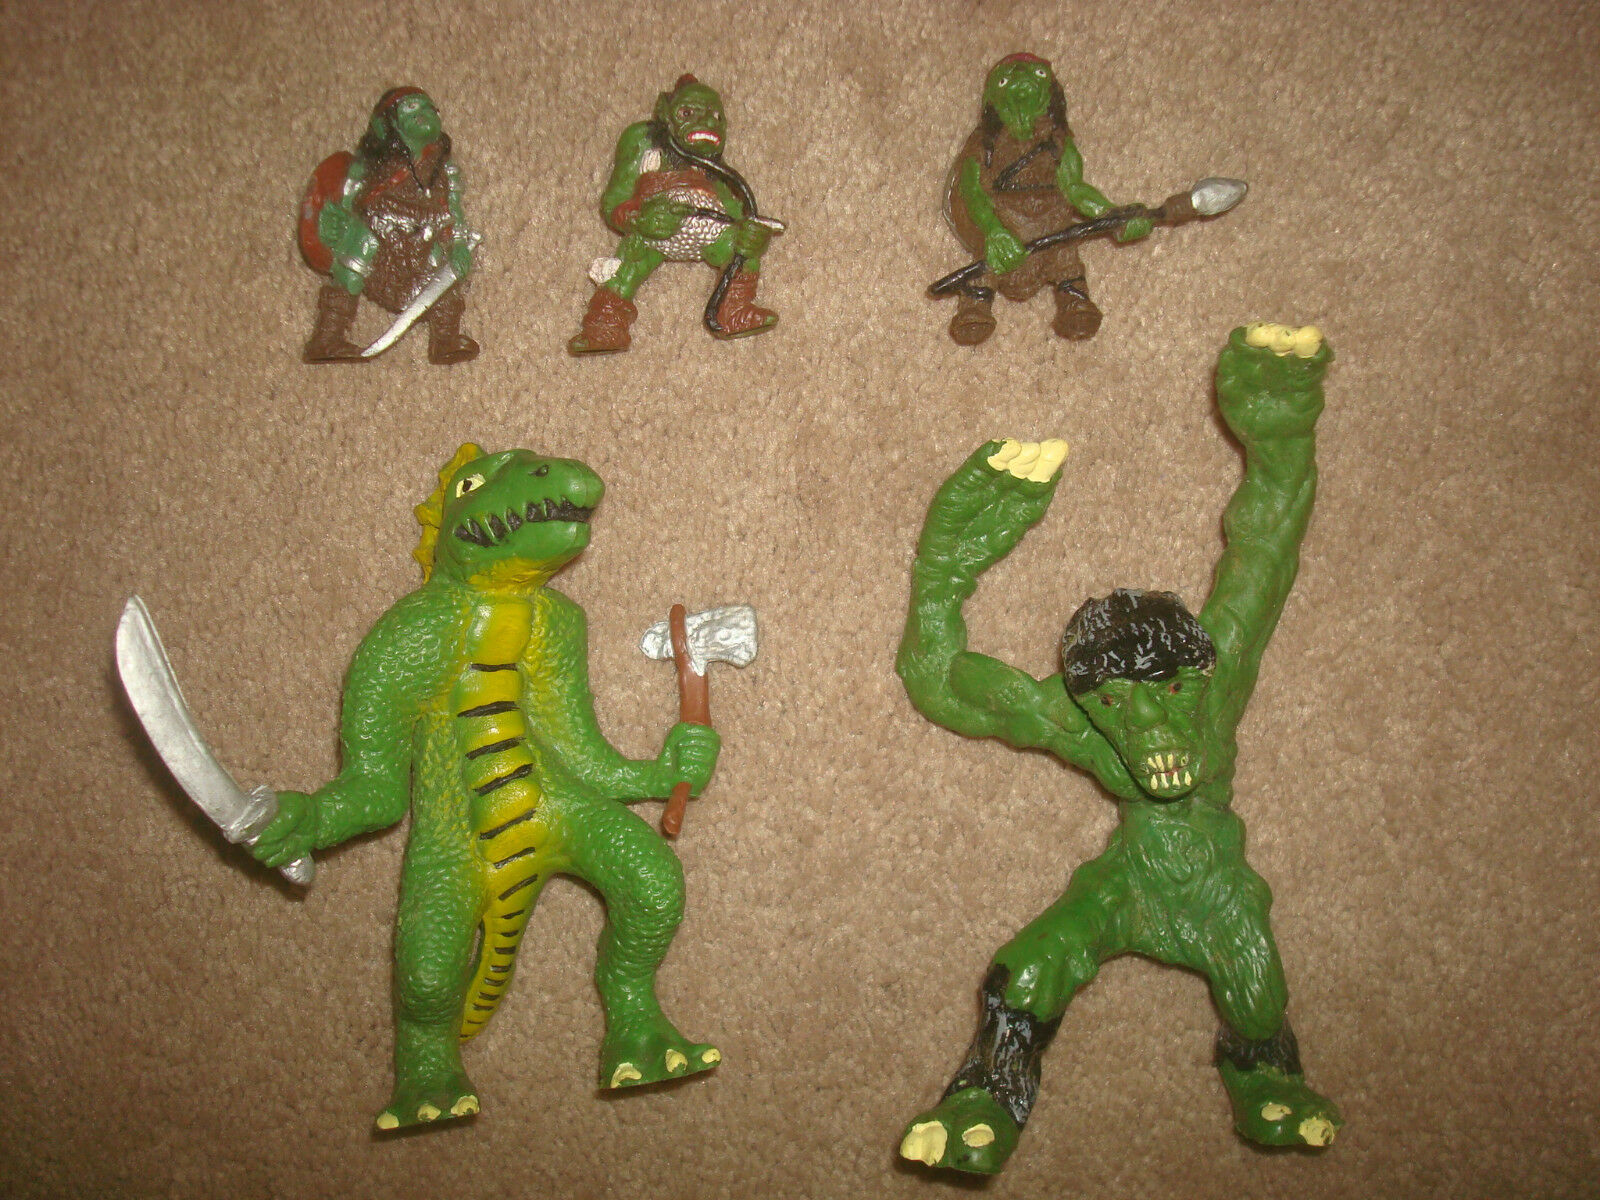 Vintage Dungeons & Dragons Dragons Dragons Toy Figure LOT 1982 Goblin Troglodyte Terrible Troll 305729